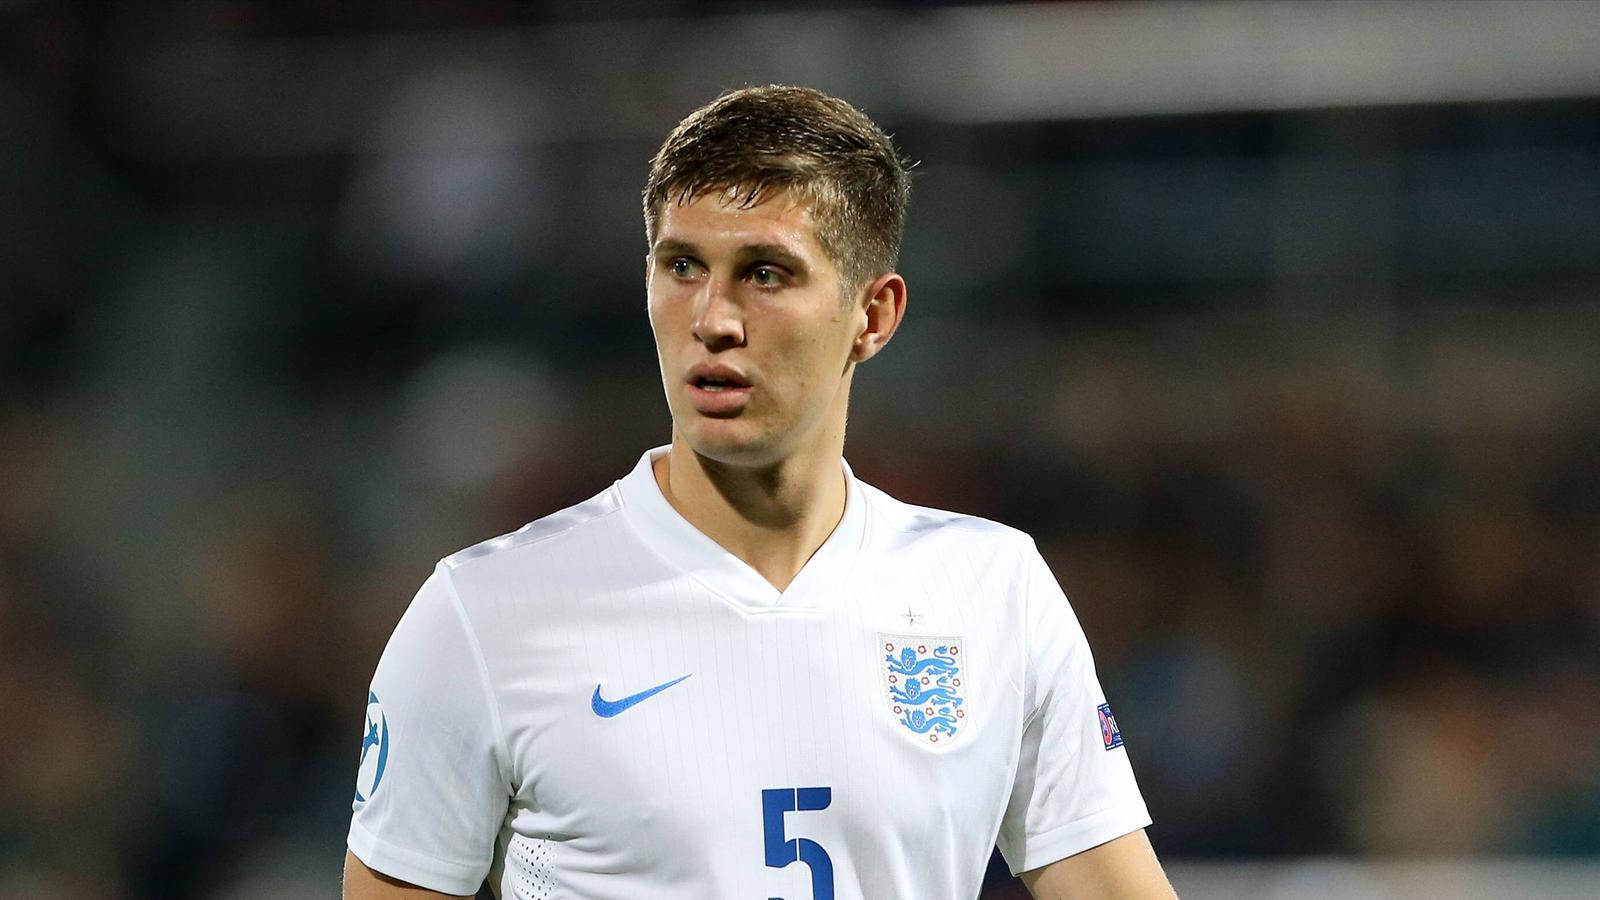 John Stones, Jonjo Shelvey and Jamie Vardy to start for England in San Marino - Euro 2016 ...